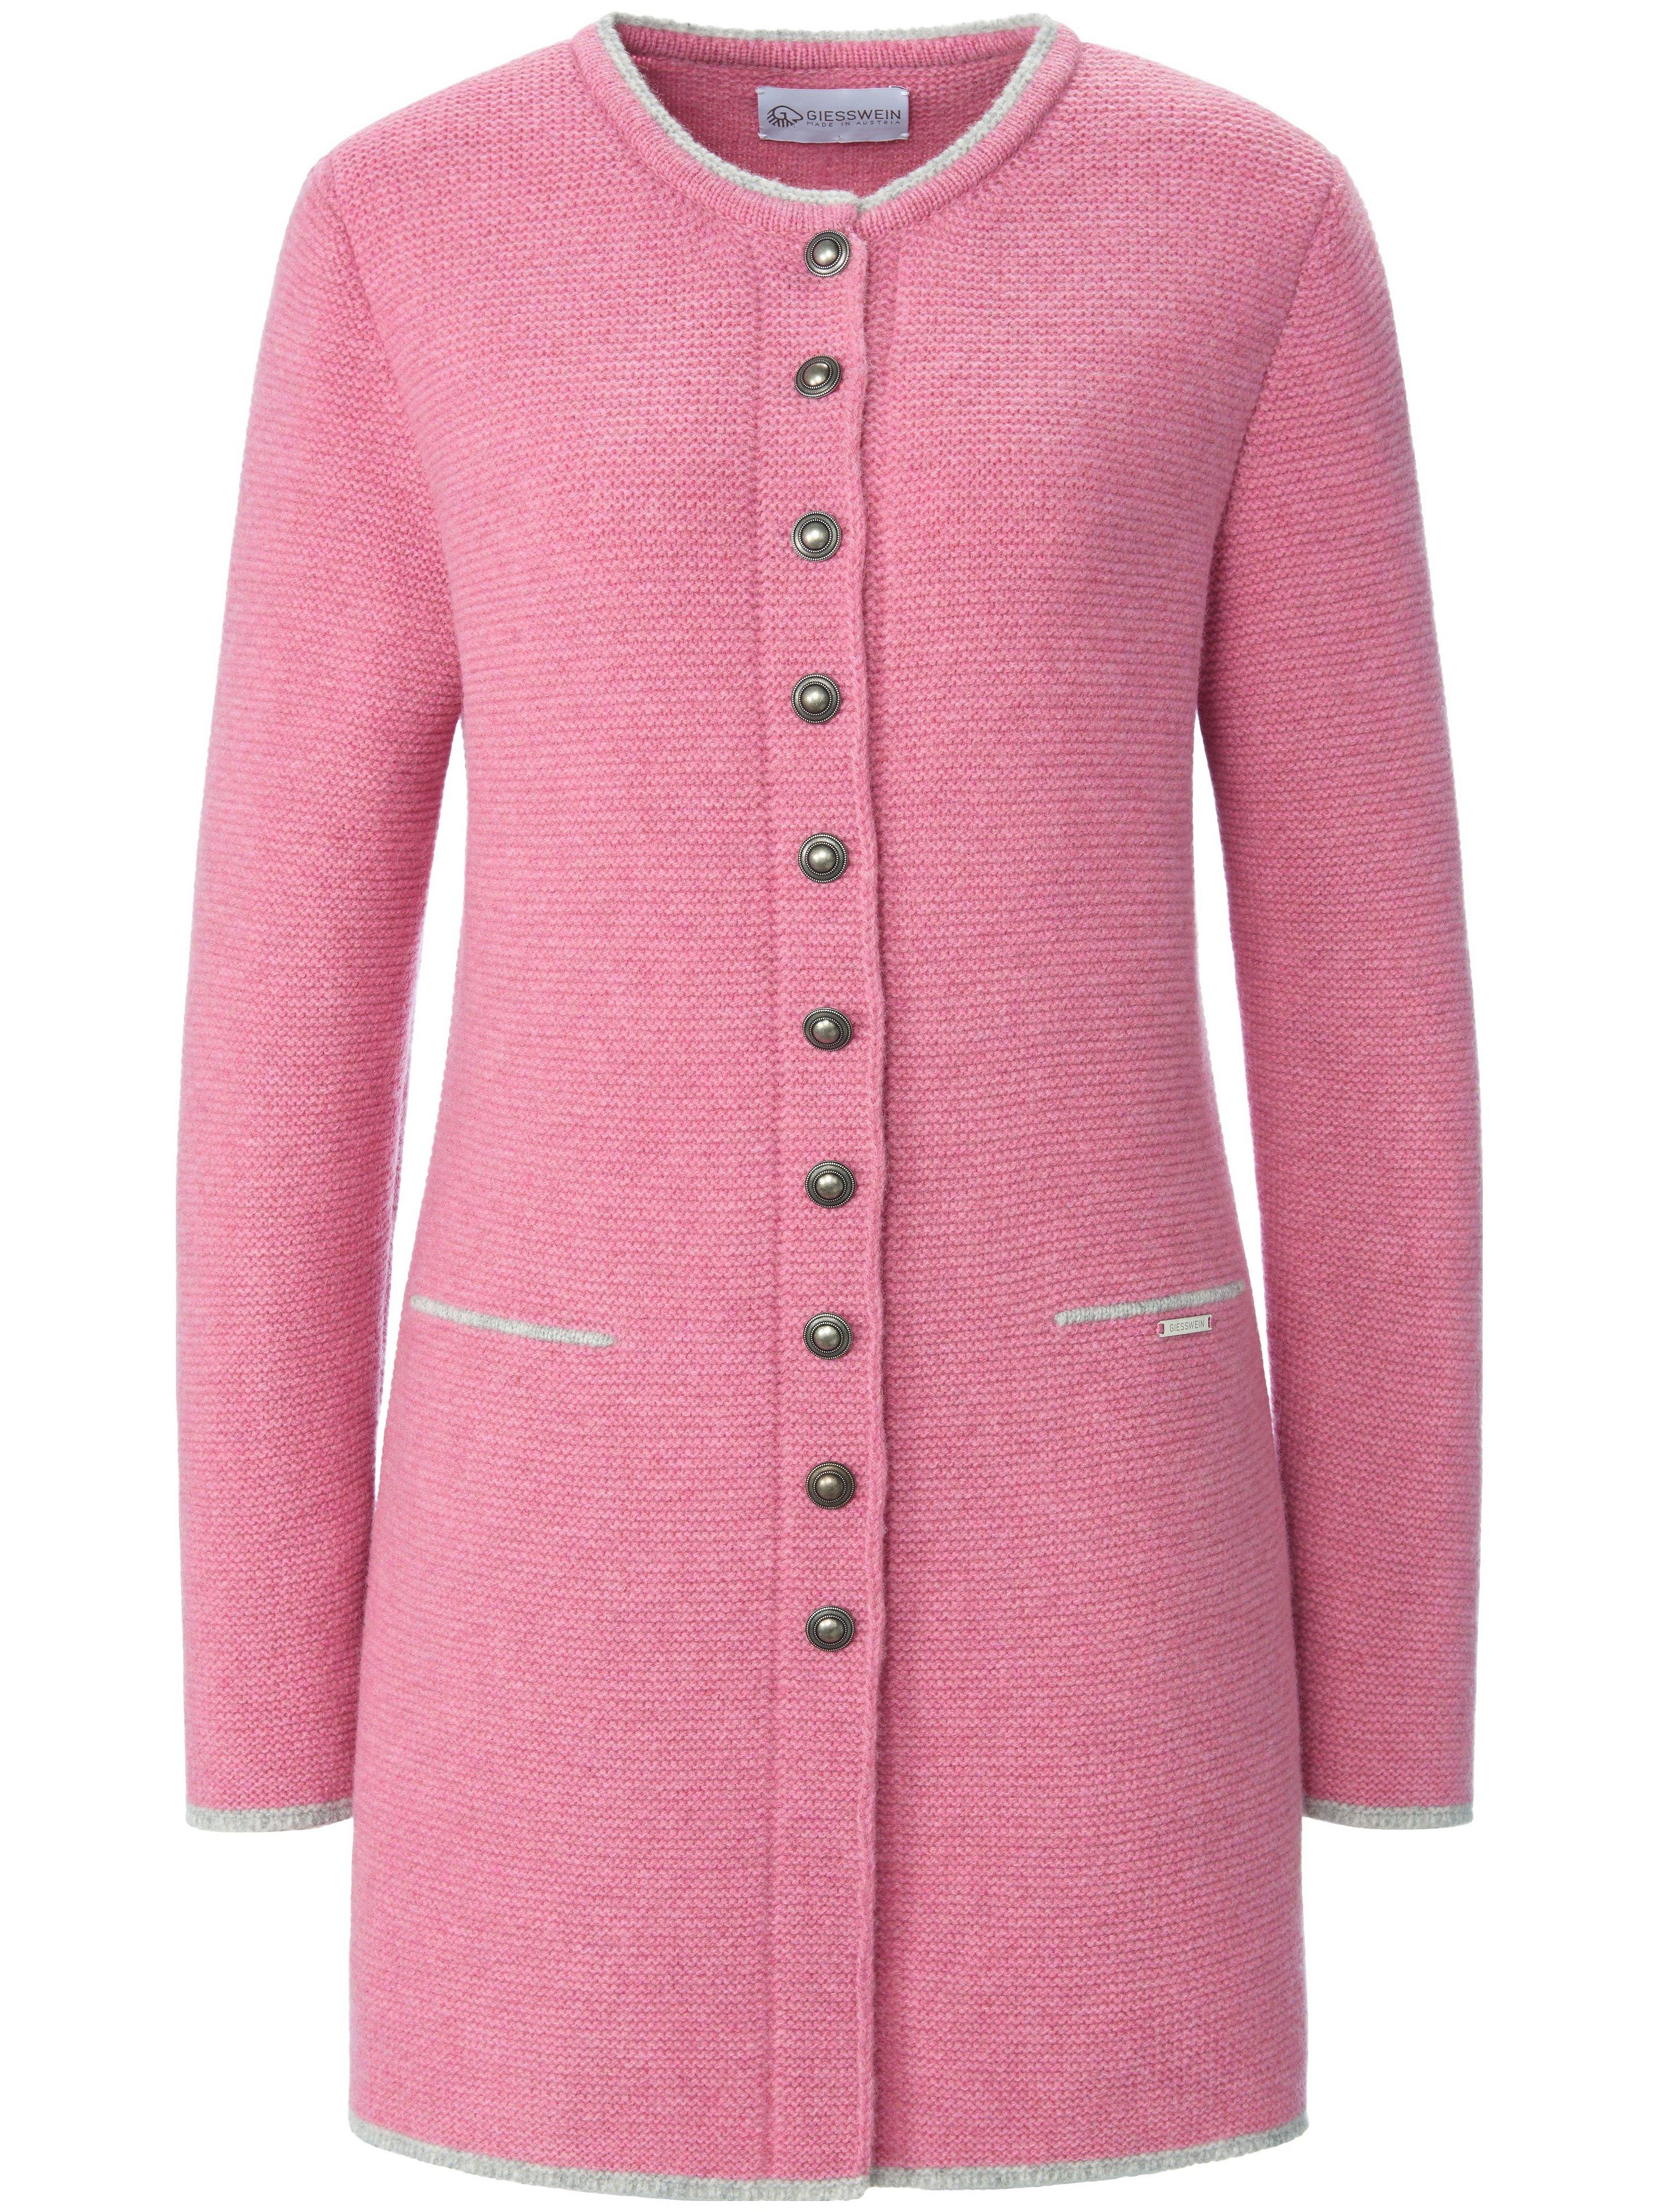 La redingote Lotte 100% laine vierge  Giesswein rose taille 50